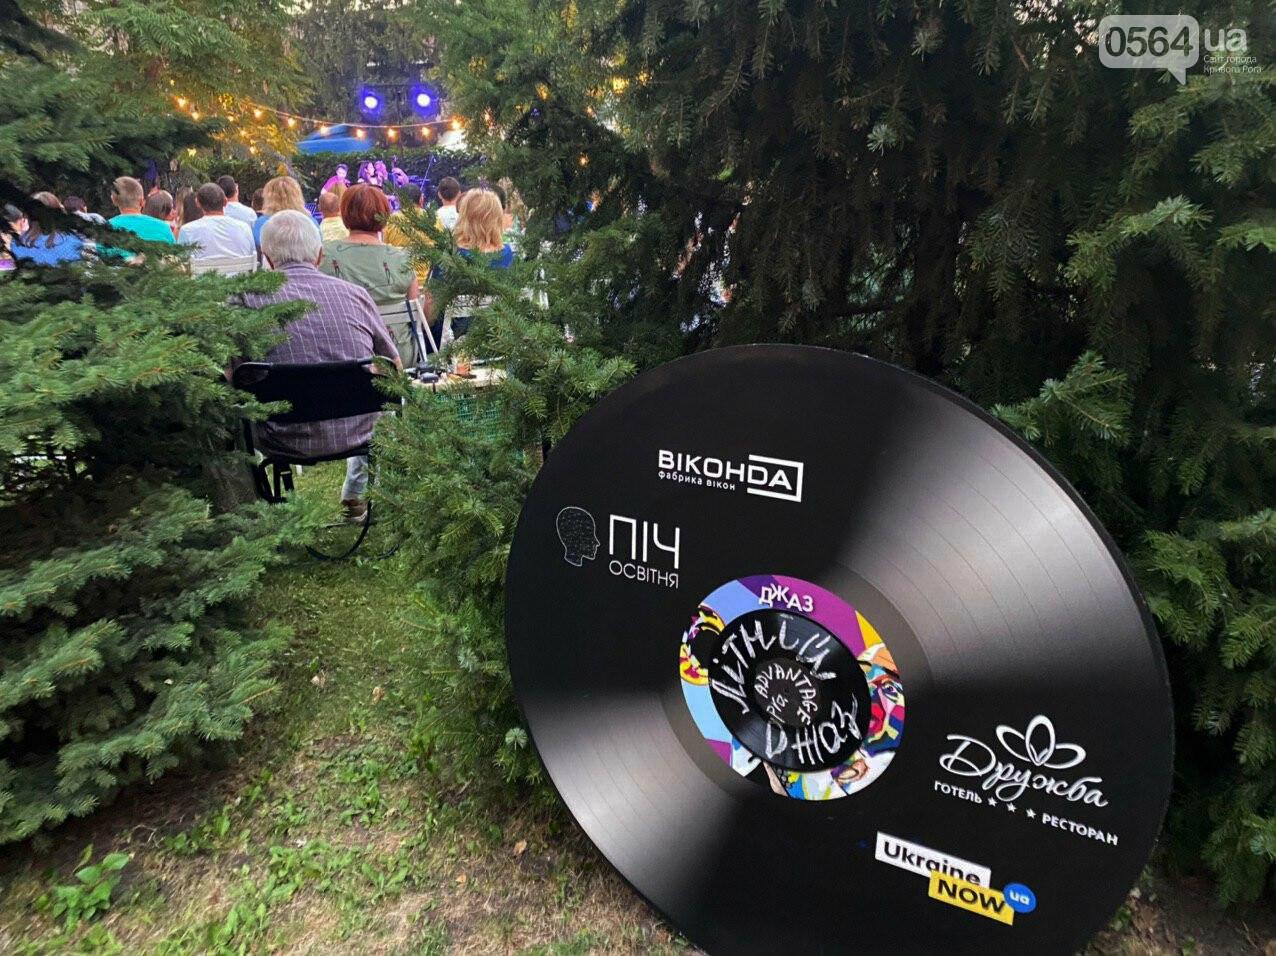 Под звездным небом криворожане наслаждались летним джазом от  Advantage Project, - ФОТО, ВИДЕО , фото-26